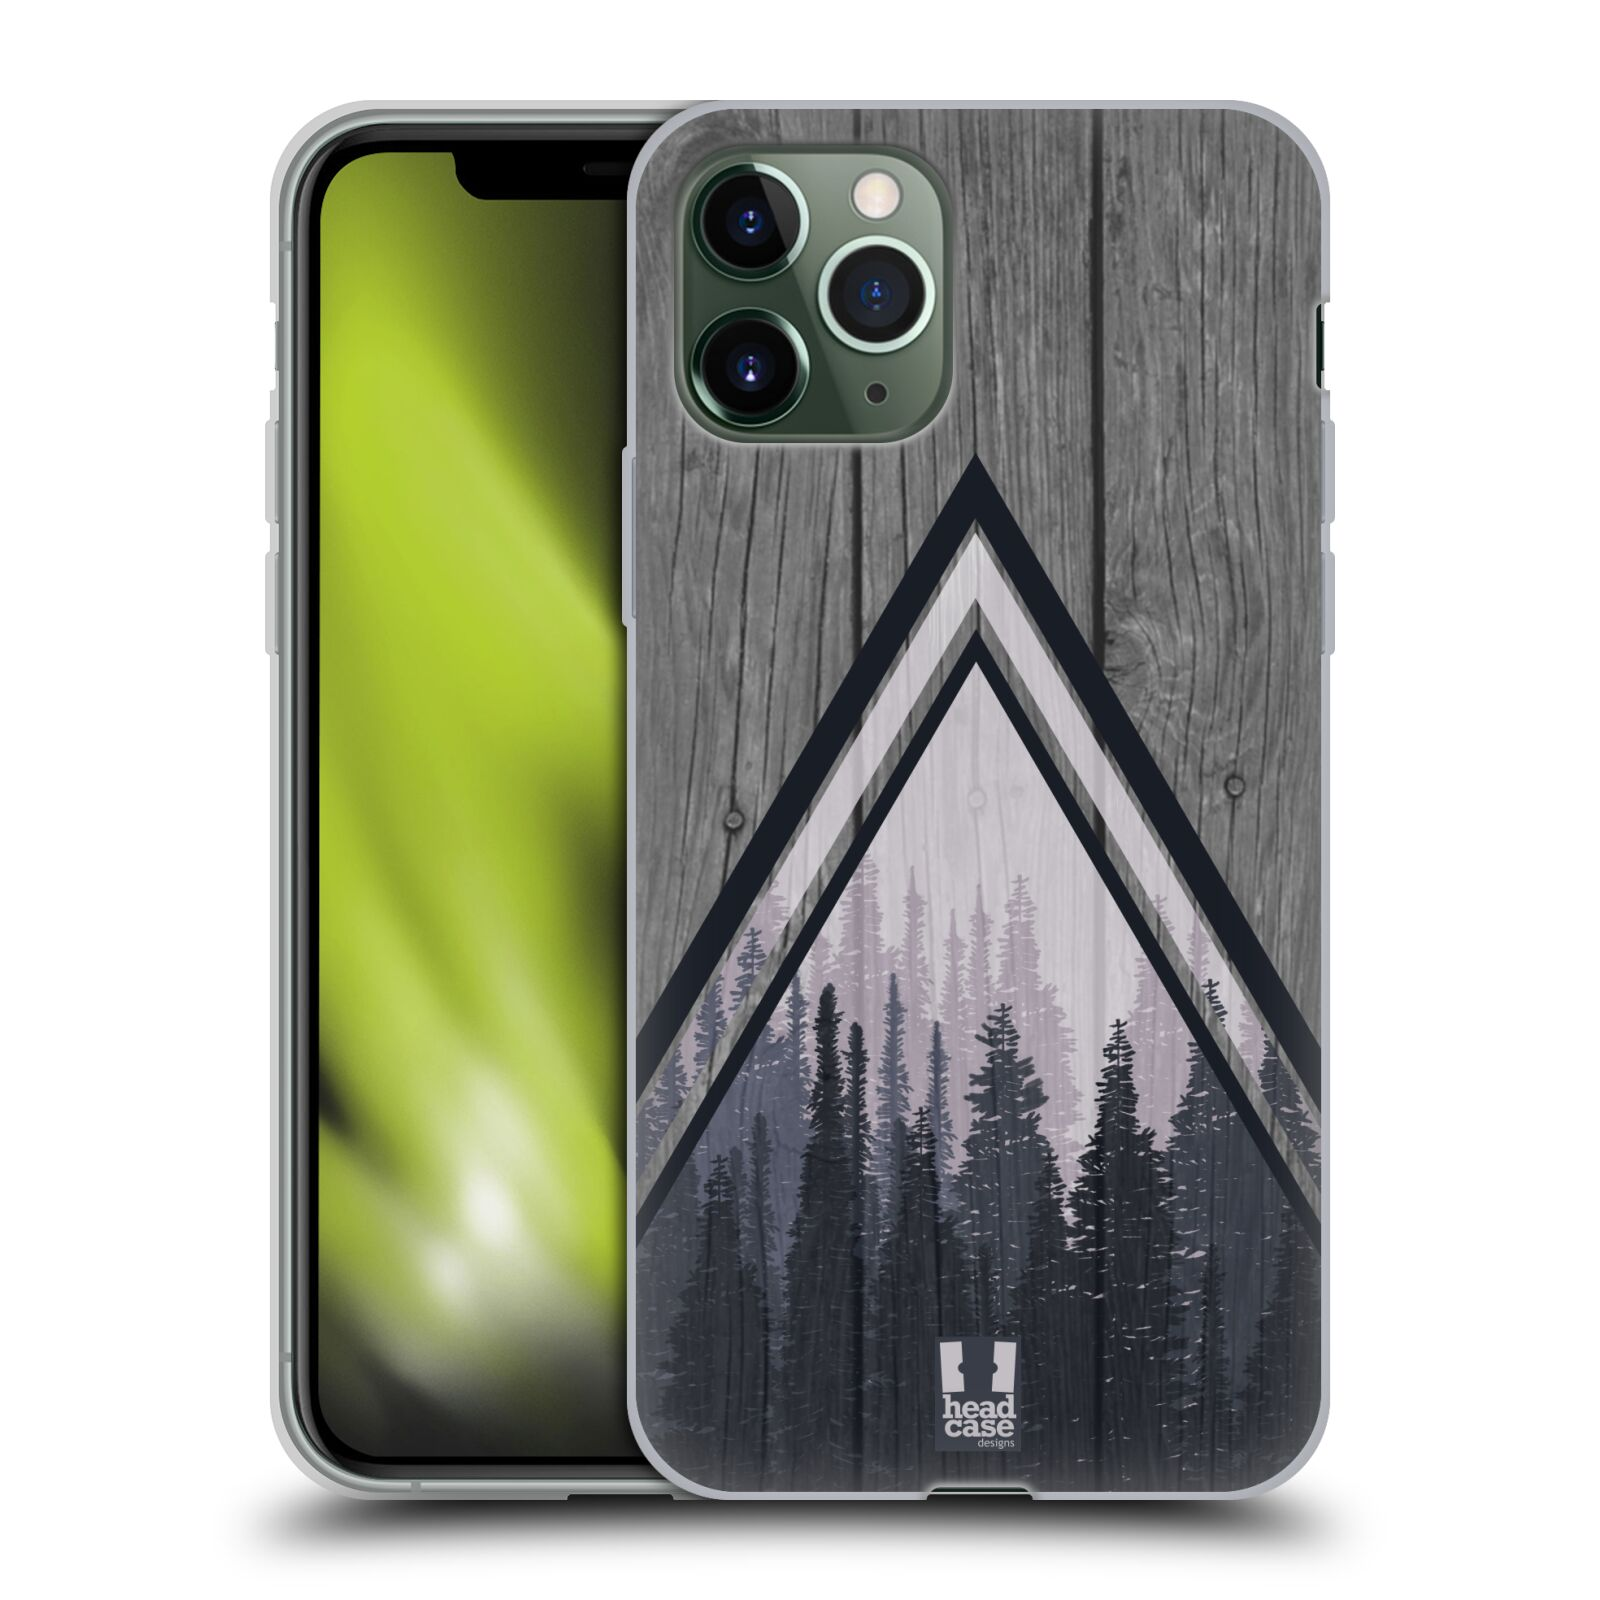 koupit iphone - Silikonové pouzdro na mobil Apple iPhone 11 Pro - Head Case - Dřevo a temný les